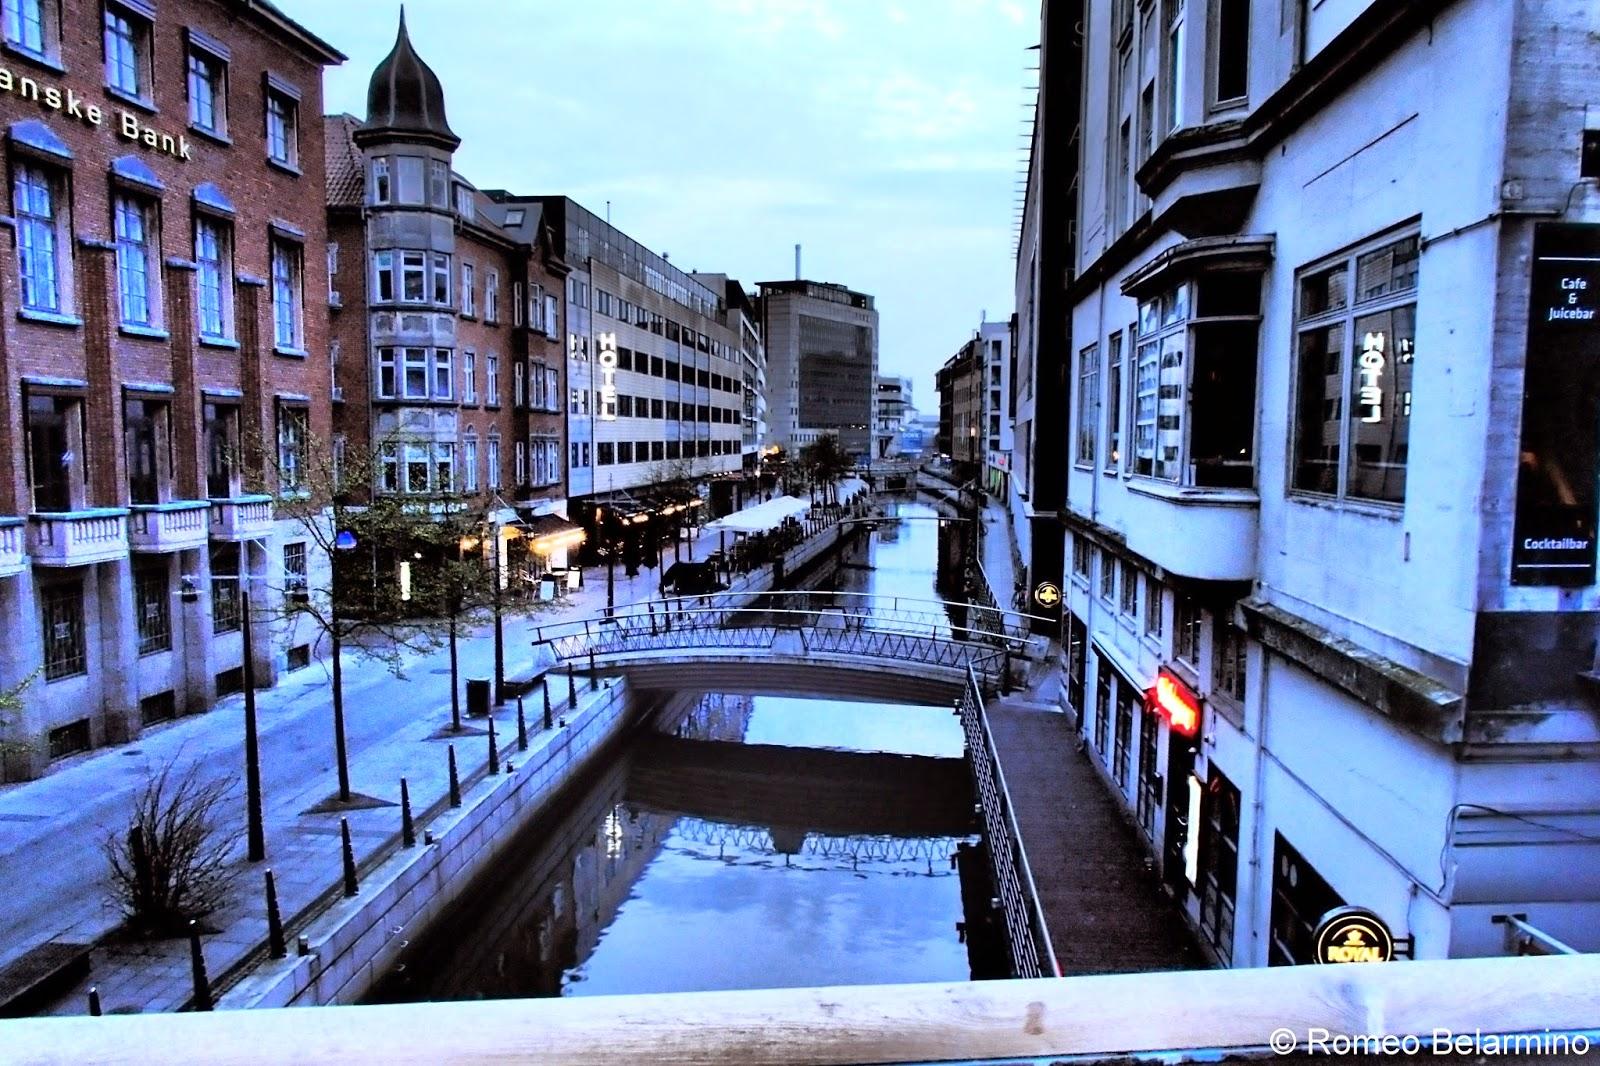 Aarhus Denmark  city photos gallery : Aarhus Canal Denmark